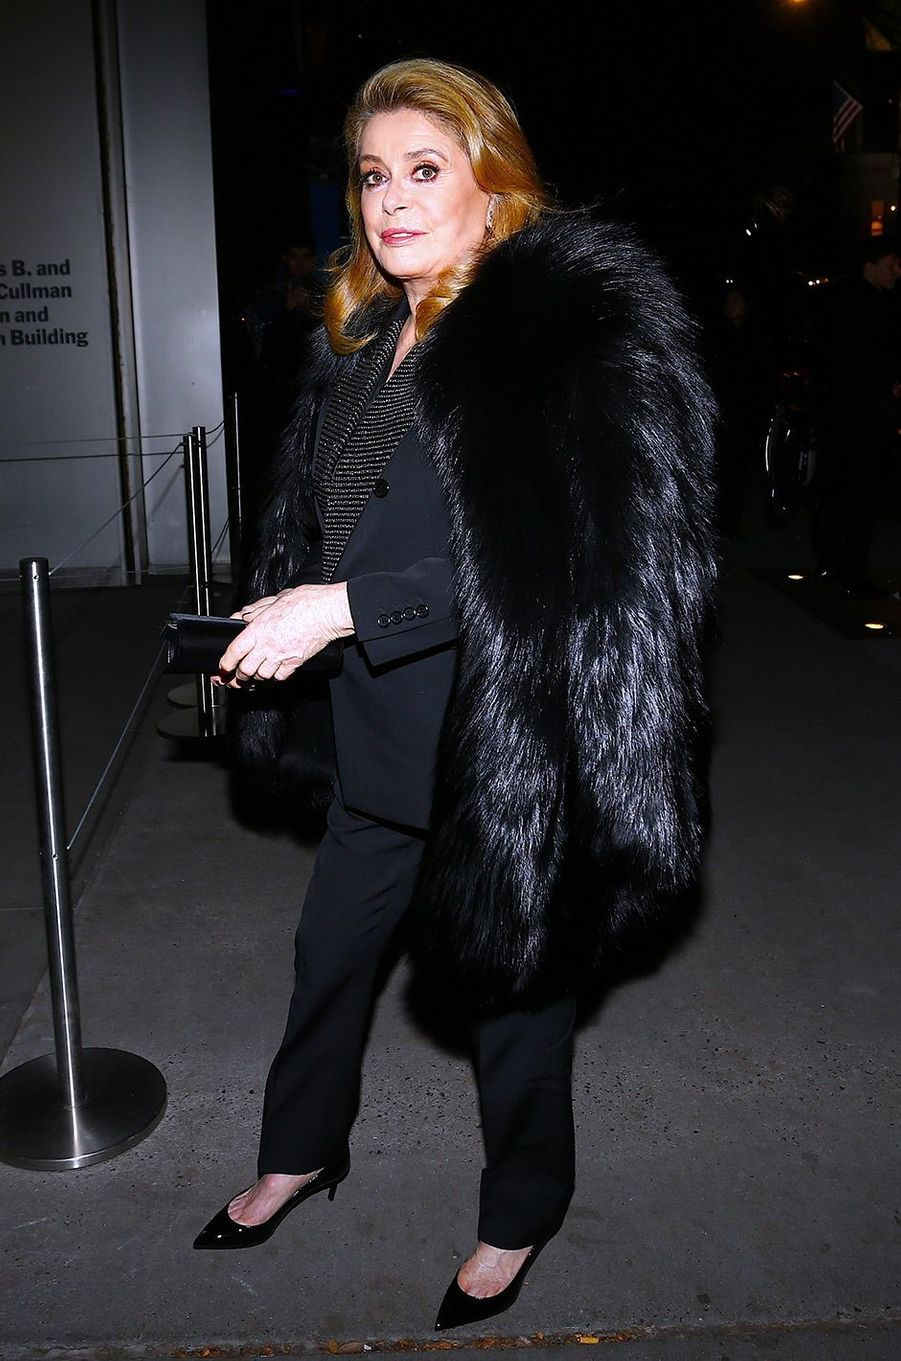 Catherine Deneuve à New York, mercredi 19 décembre